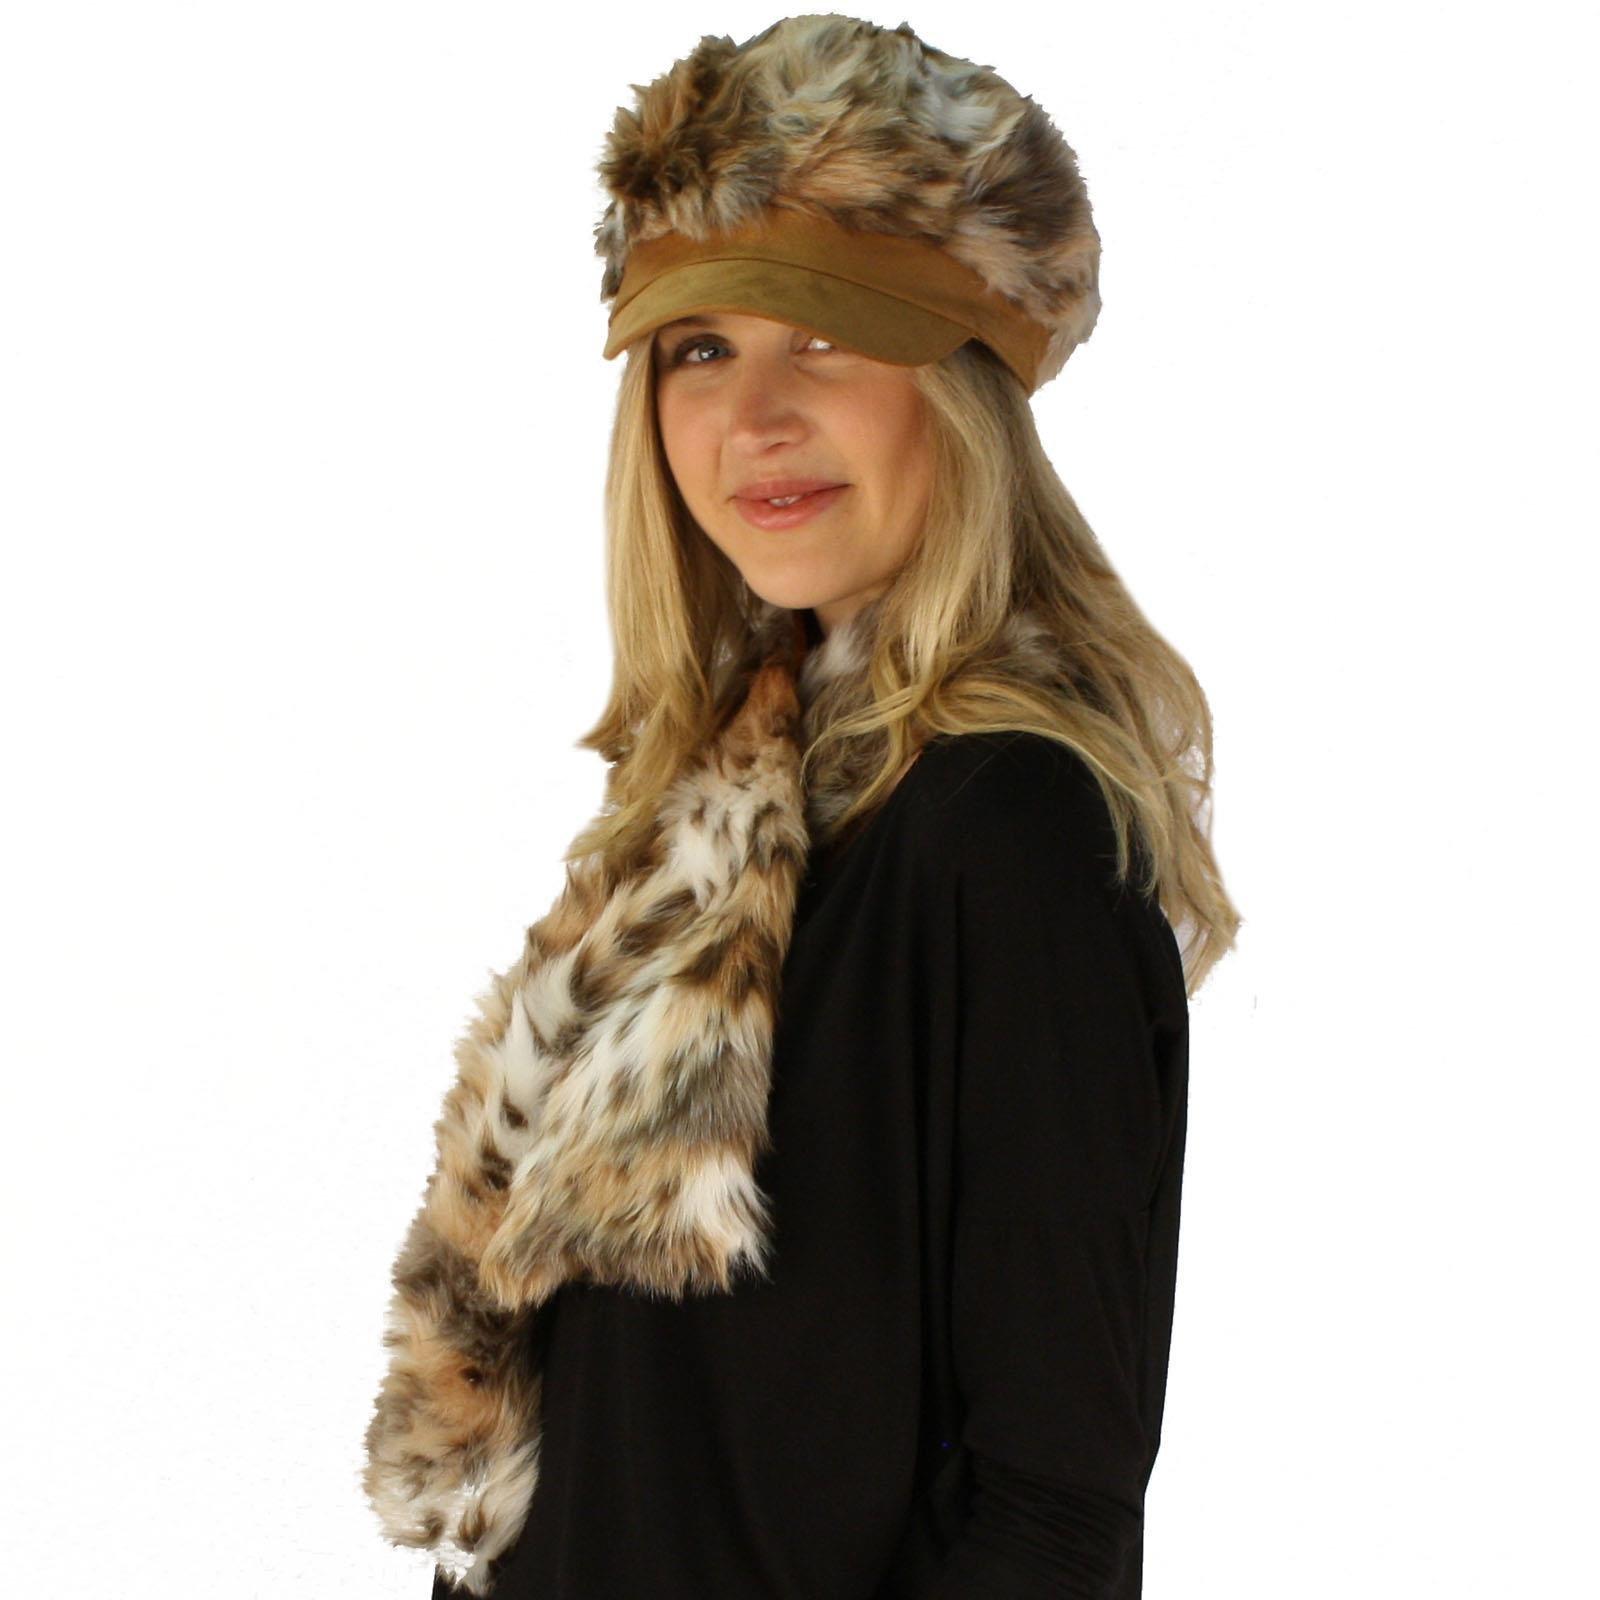 c862c114bc14 Amazon.com: Ladies Winter Soft Animal Print Faux fur Newsboy Ski Cap Hat  Scarf Set Natural (0026265171767): Books